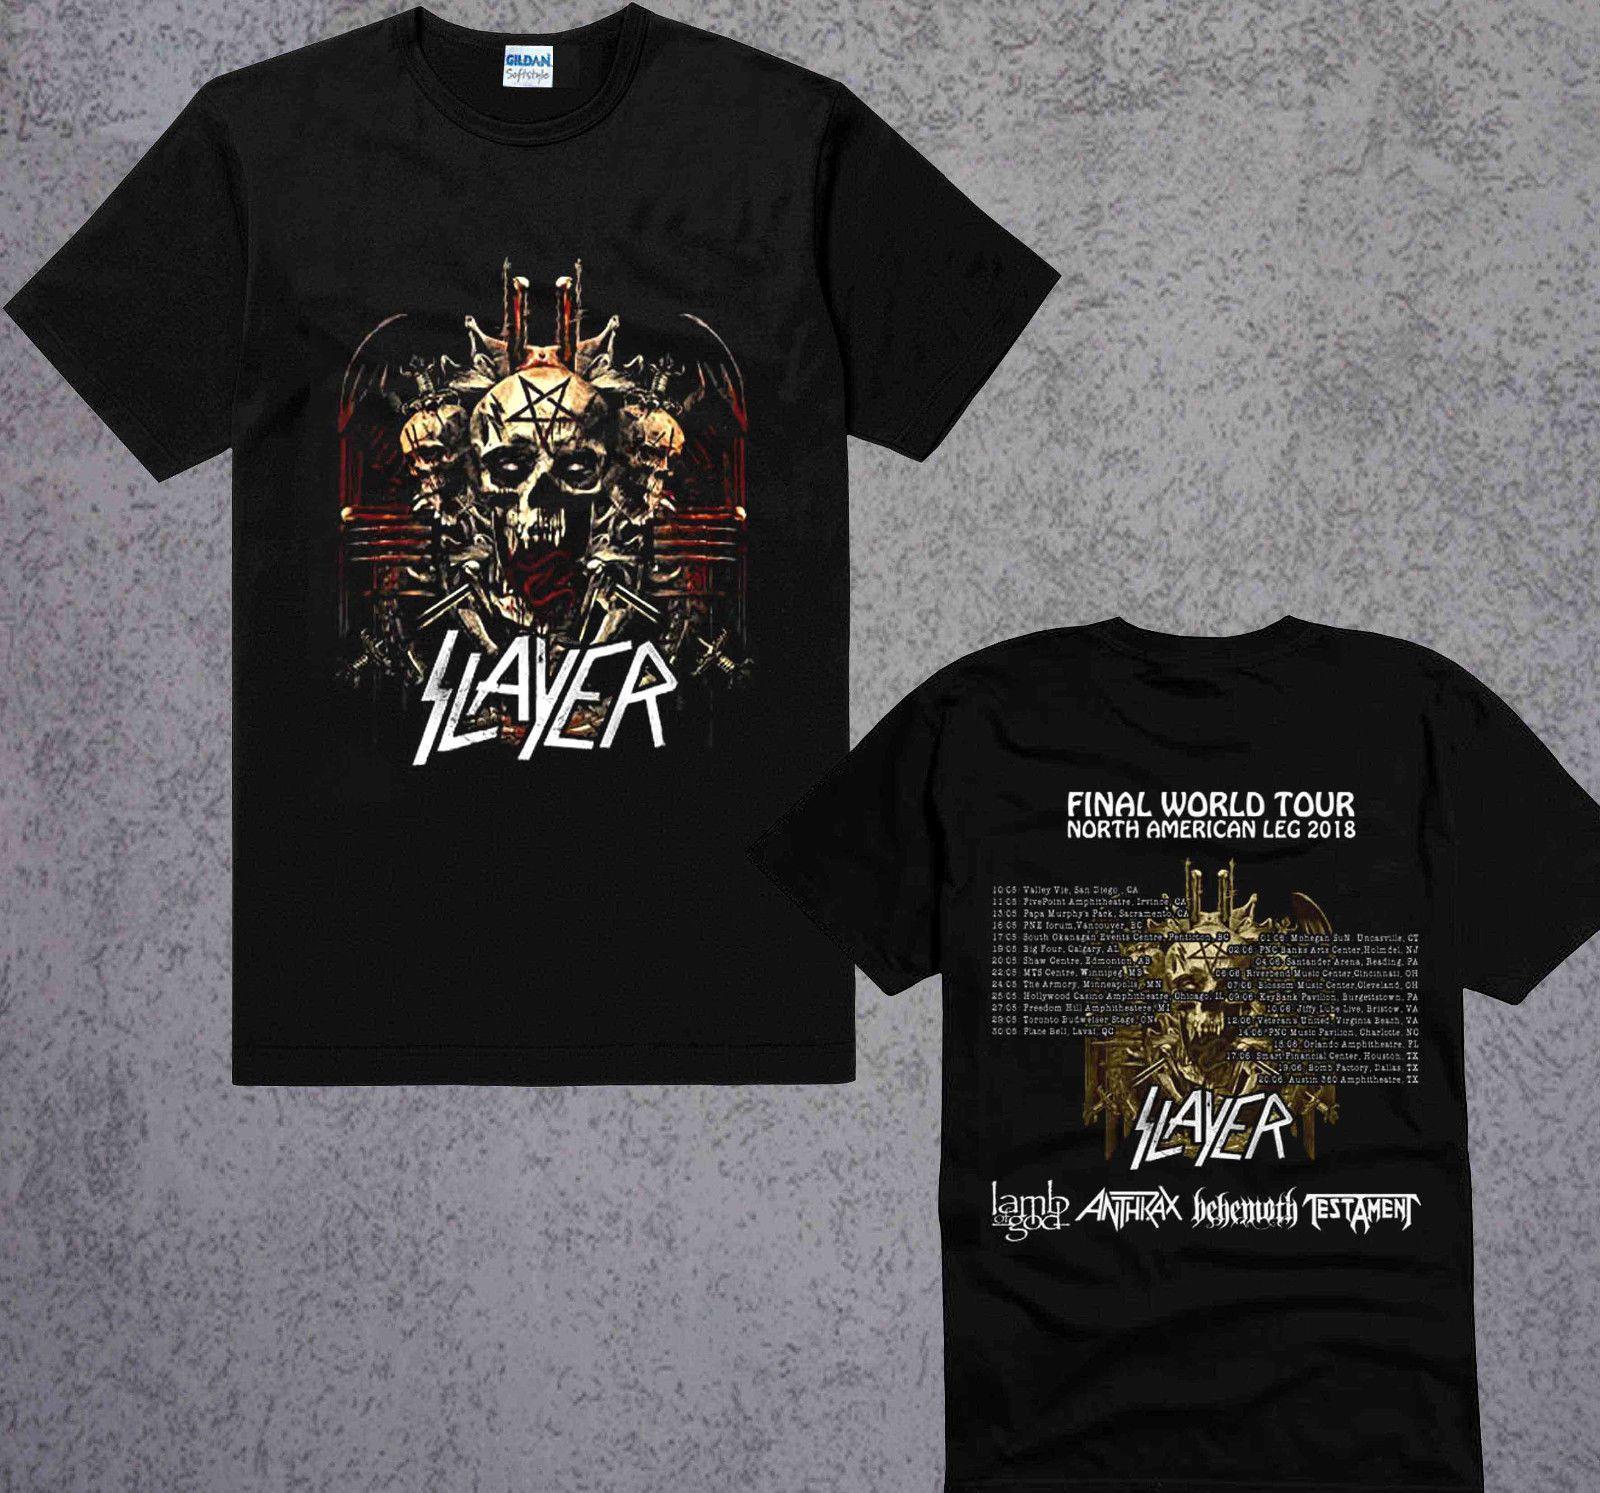 f6fe6ad8eca Slayer T Shirt Final World Tour 2018 North America Leg Lamb Of God Size S To  3XL 100% Cotton Short Sleeve Tshirt Tops High Quality Cotton Tshirt And  Shirt ...